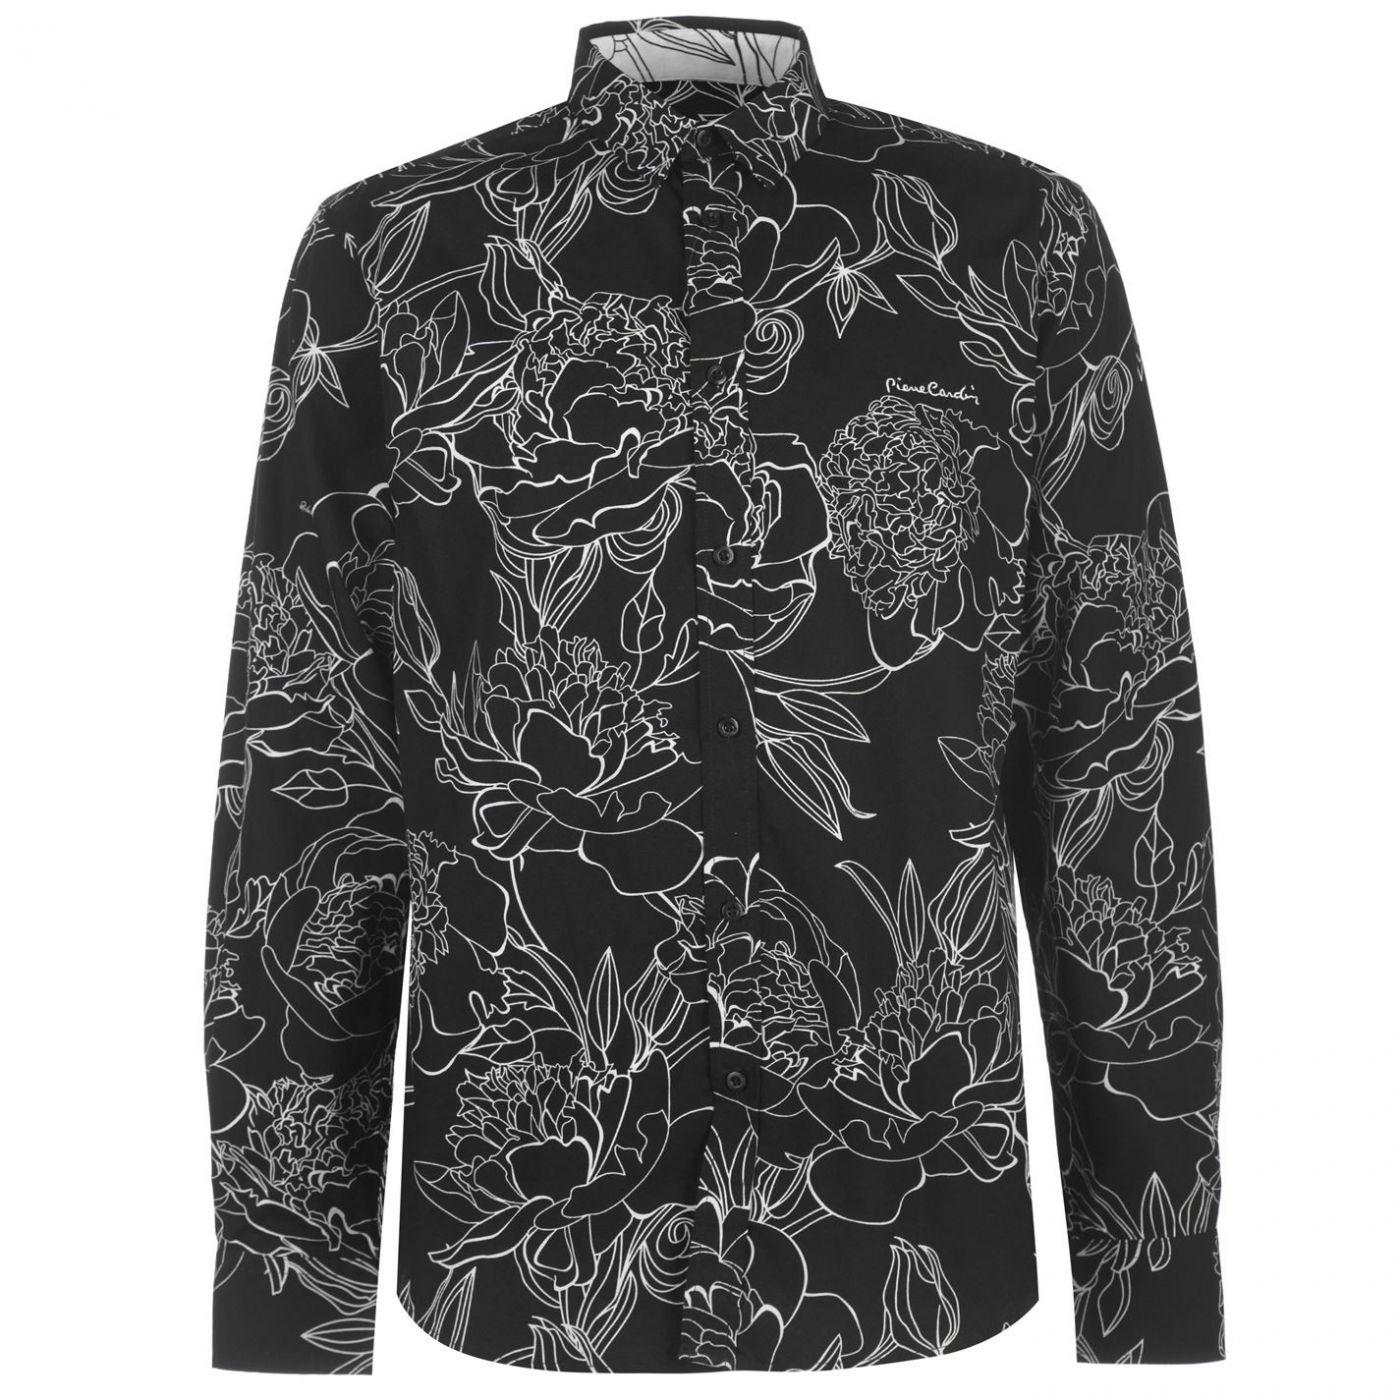 Men's Shirt Pierre Cardin Floral Patterned